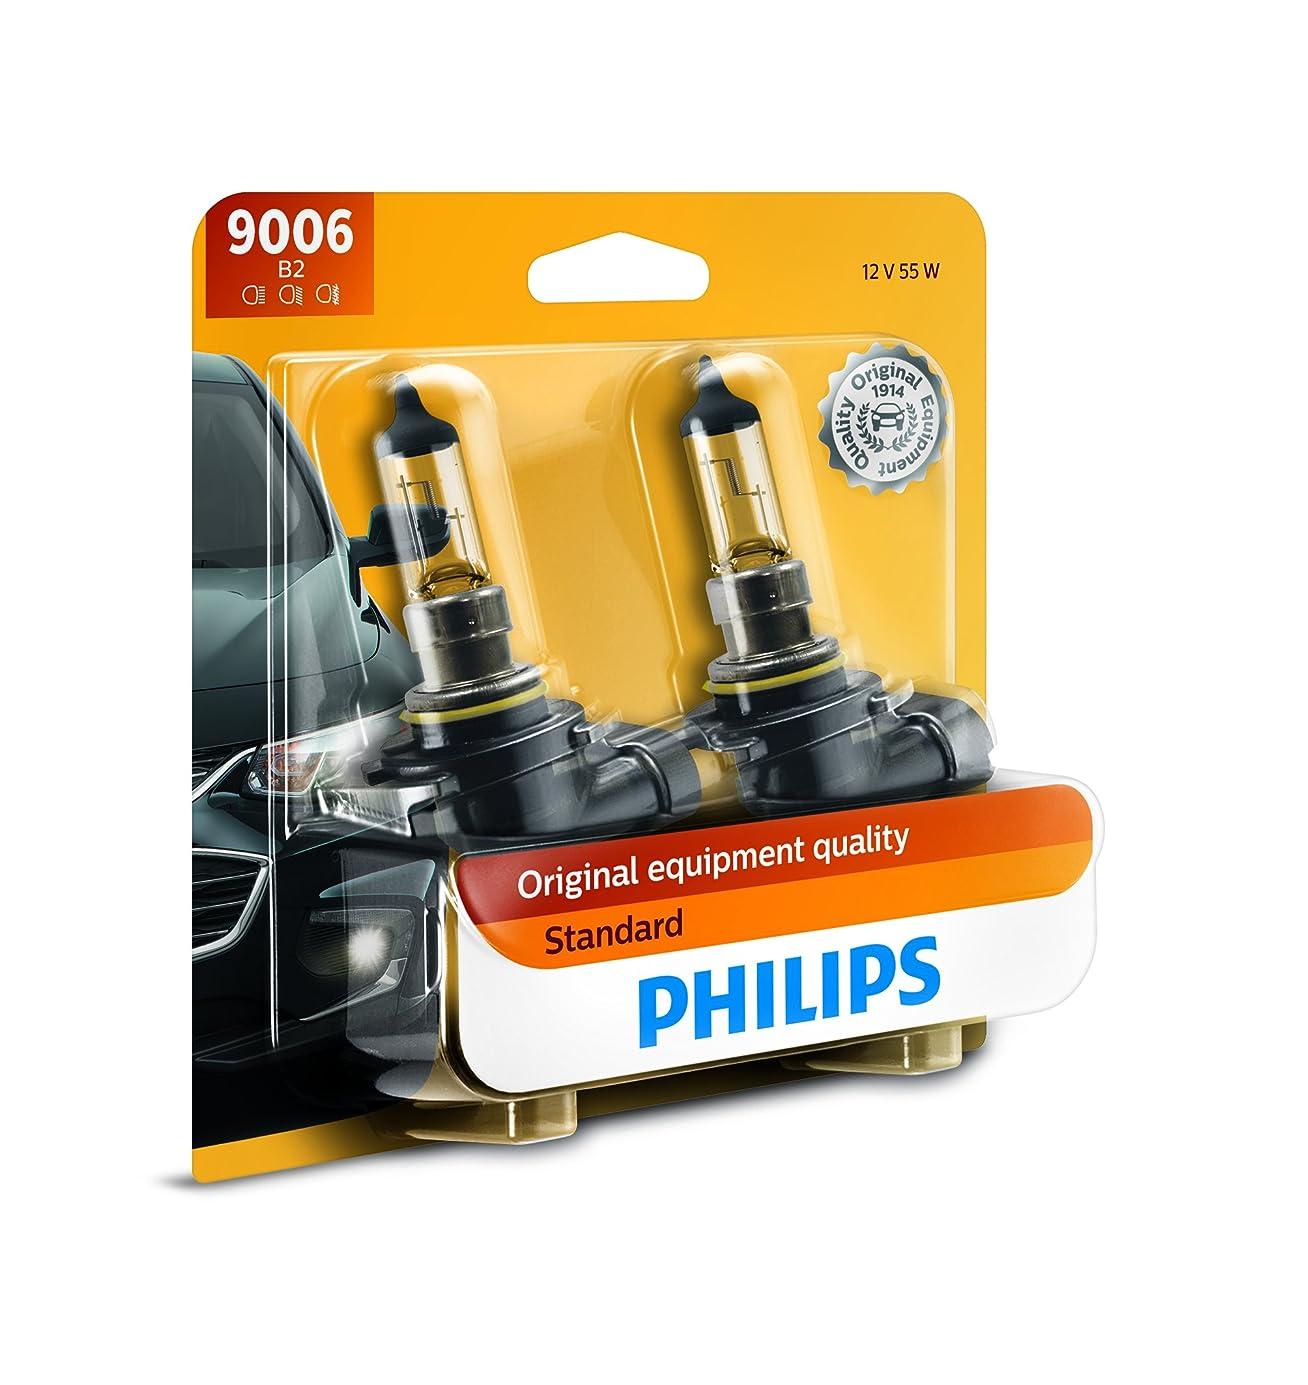 Philips 9006 Standard Halogen Replacement Headlight Bulb, 2 Pack dpqqoj6837